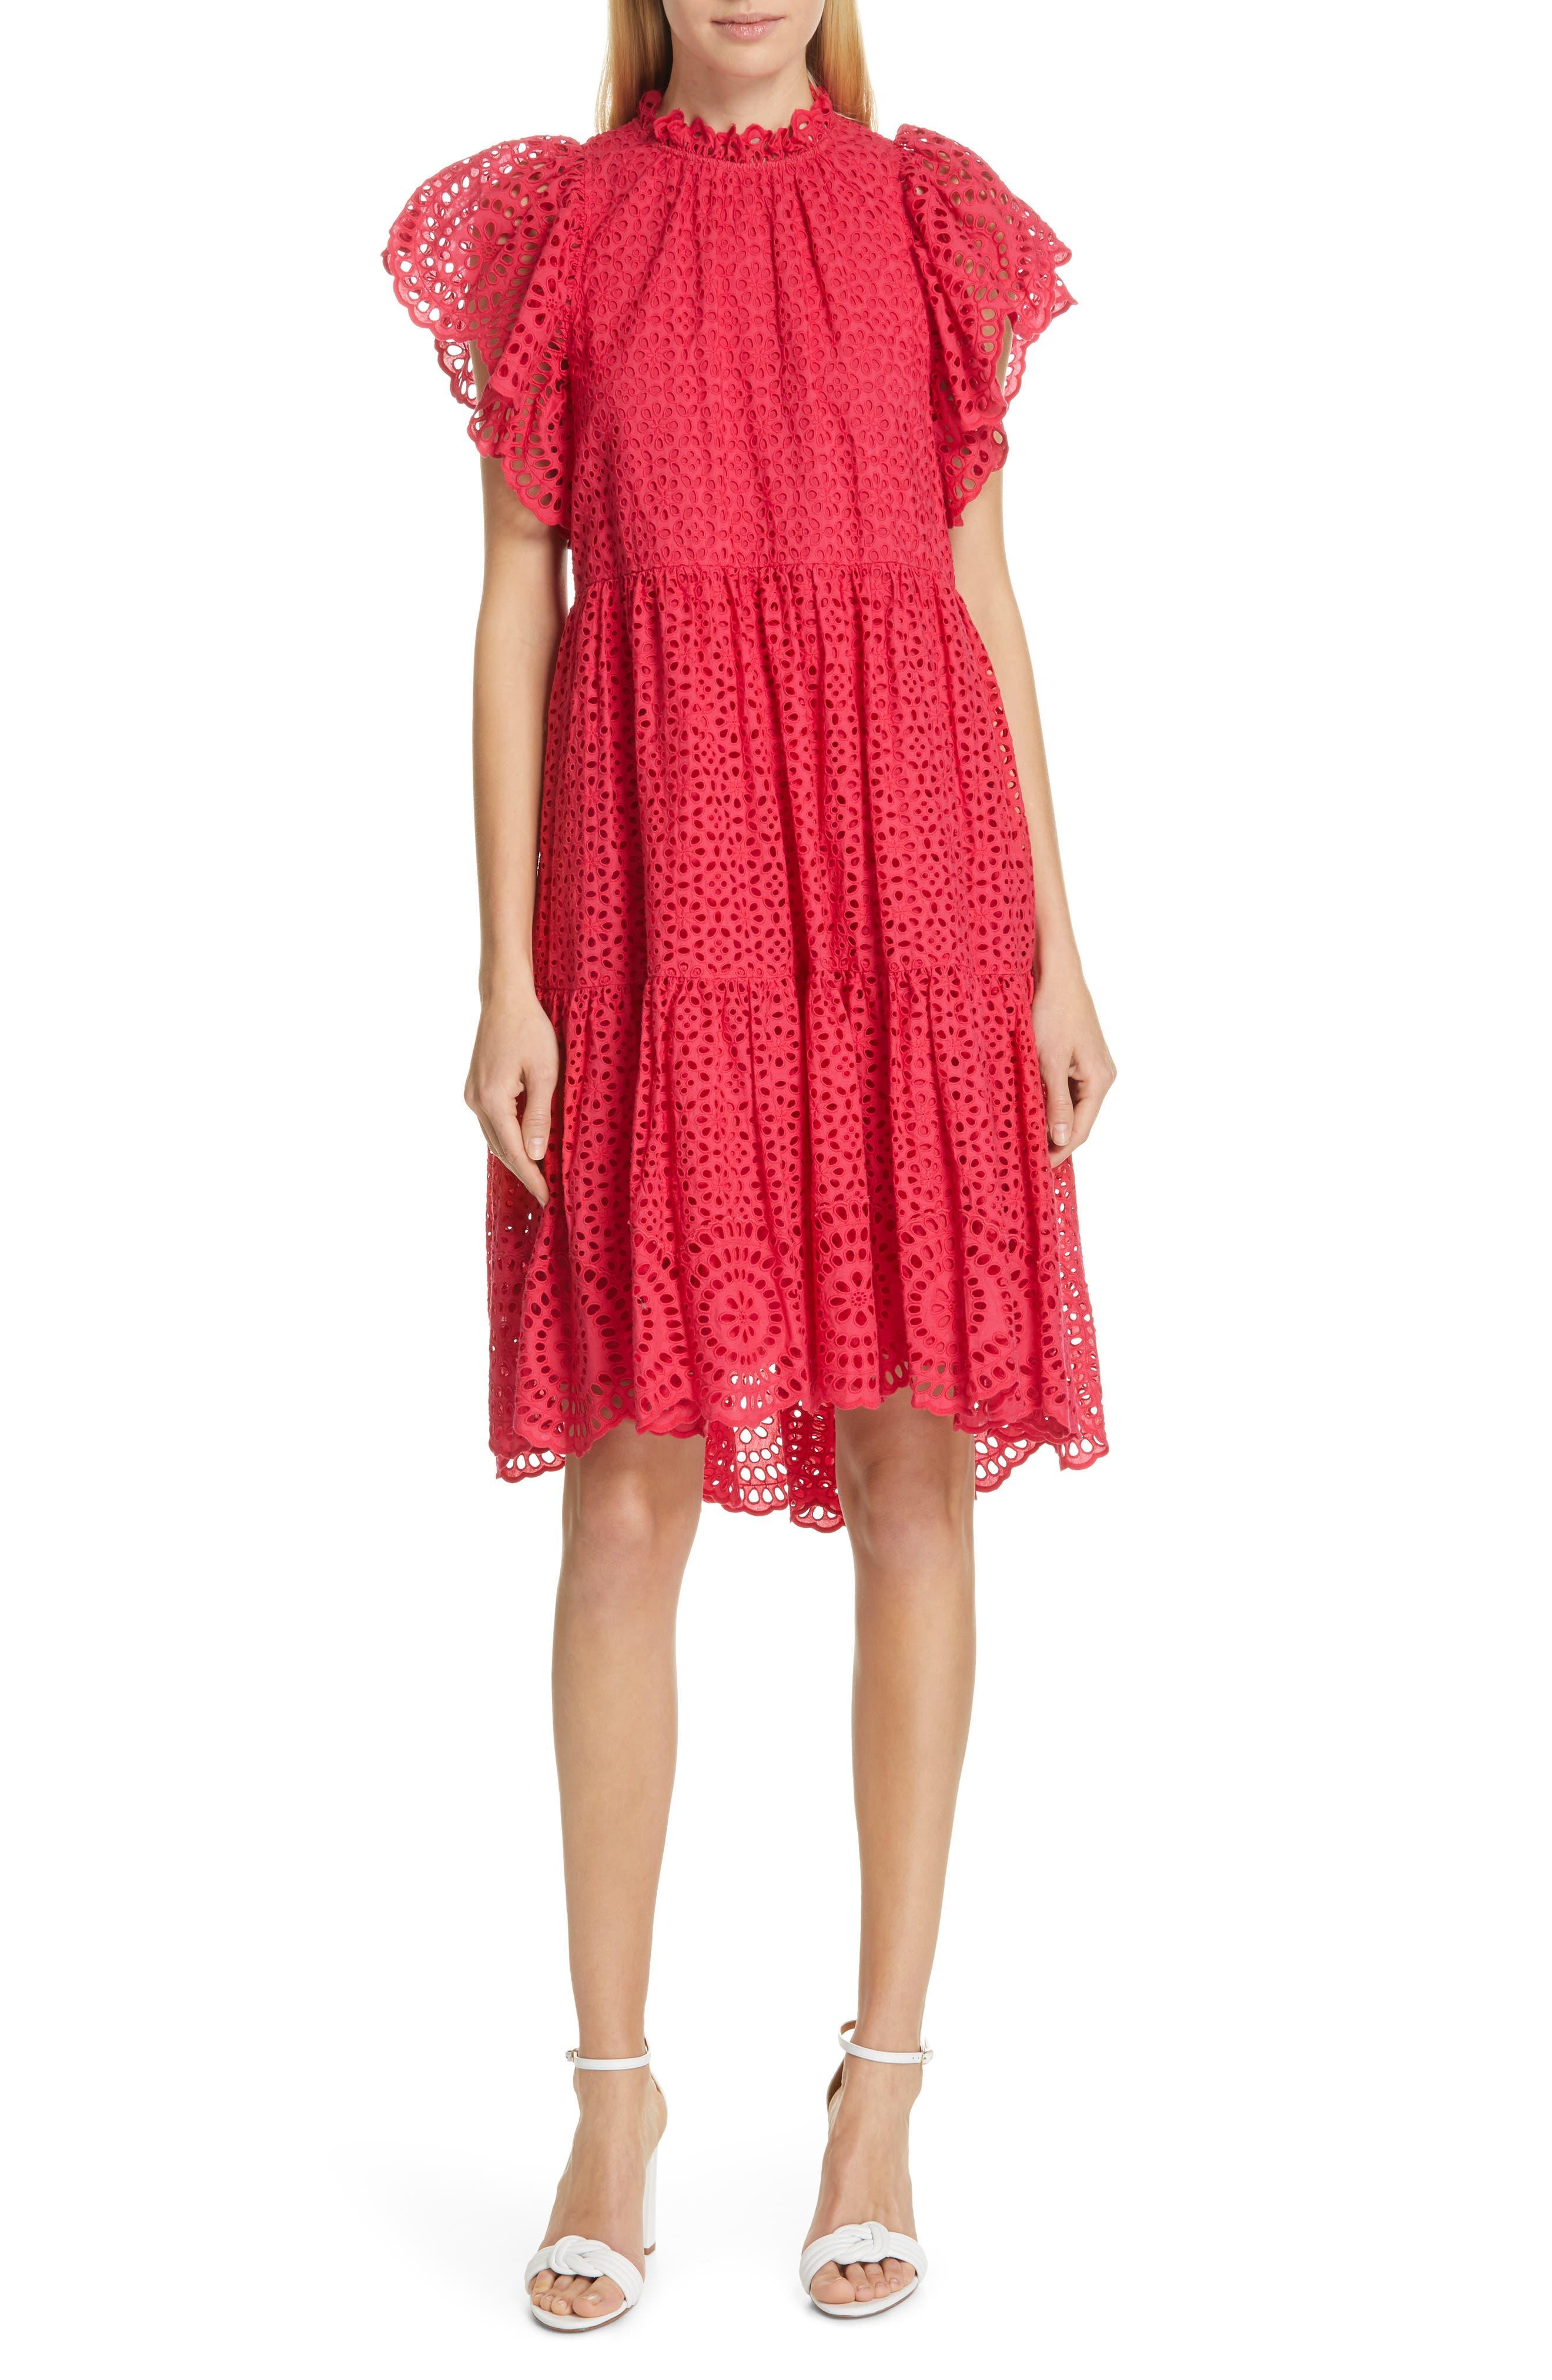 ULLA JOHNSON Norah Eyelet Dress, Main, color, FUCHSIA